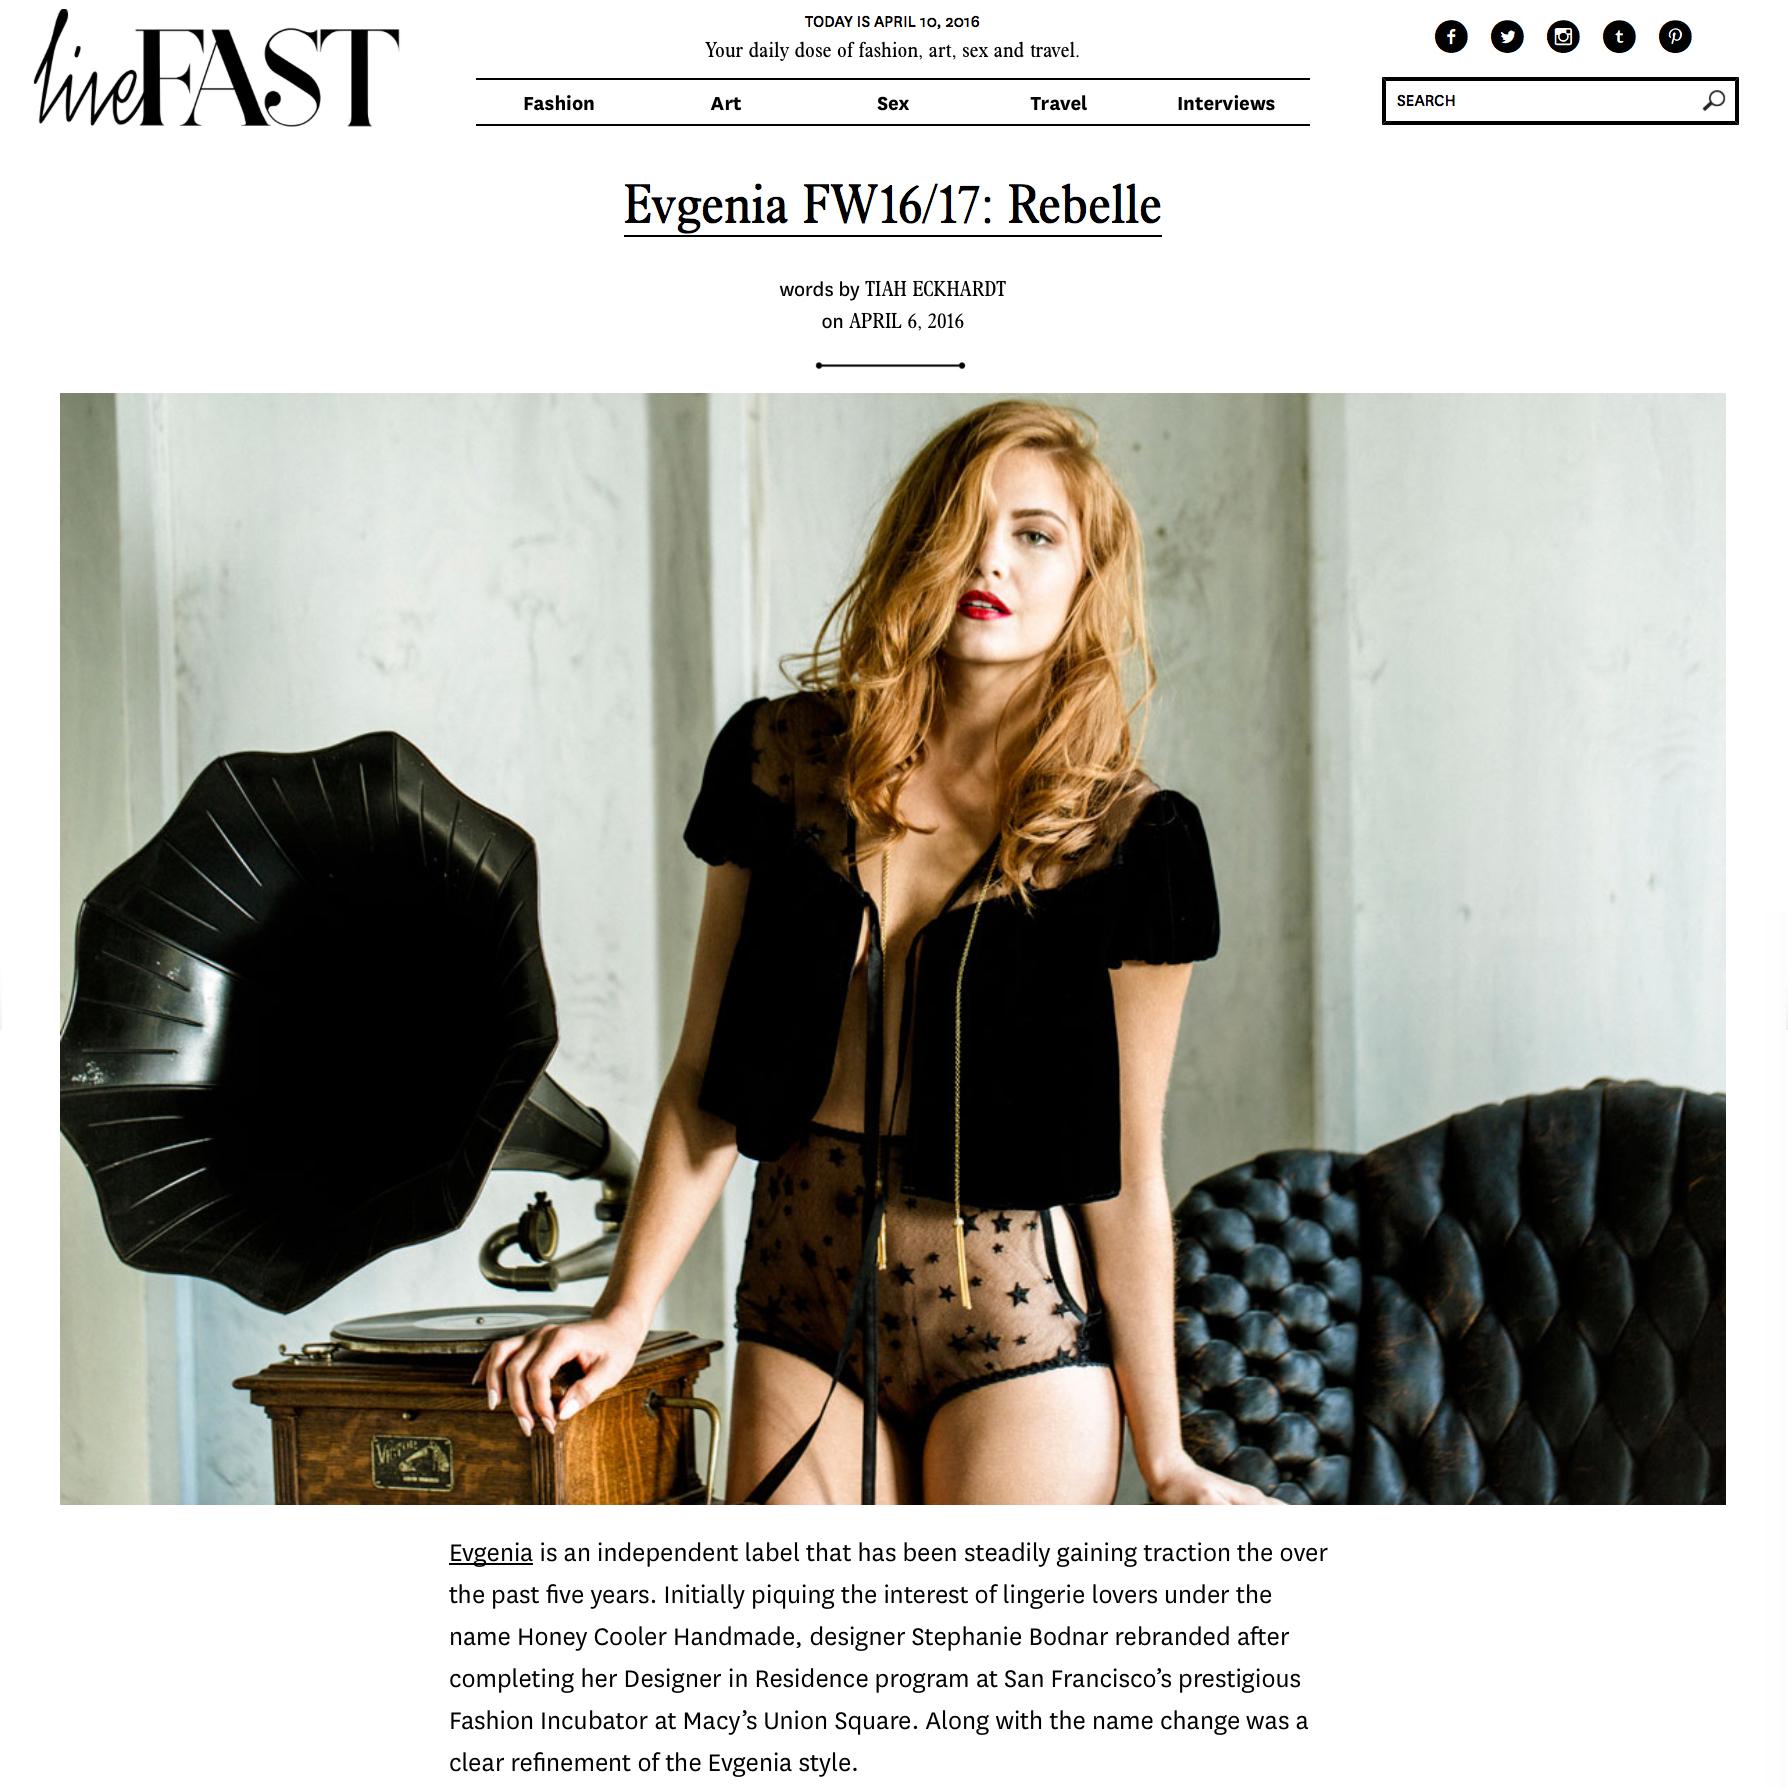 LiveFast Magazine